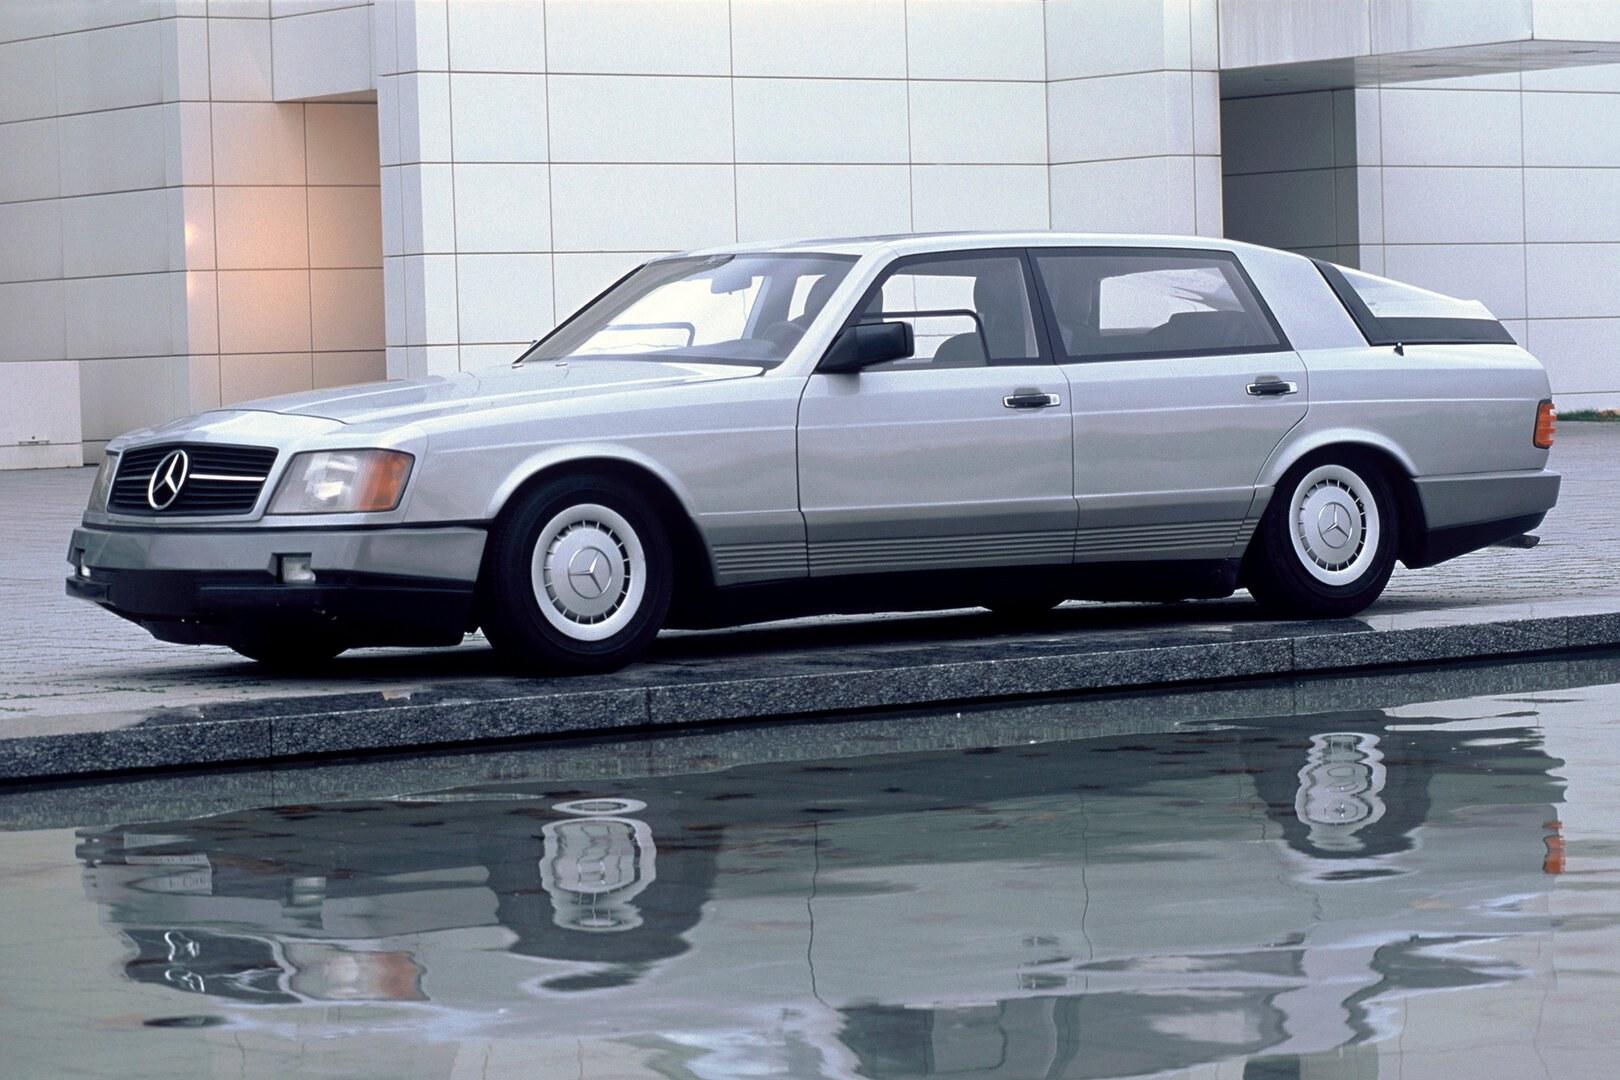 Coche del día: Mercedes-Benz Auto 2000 Concept